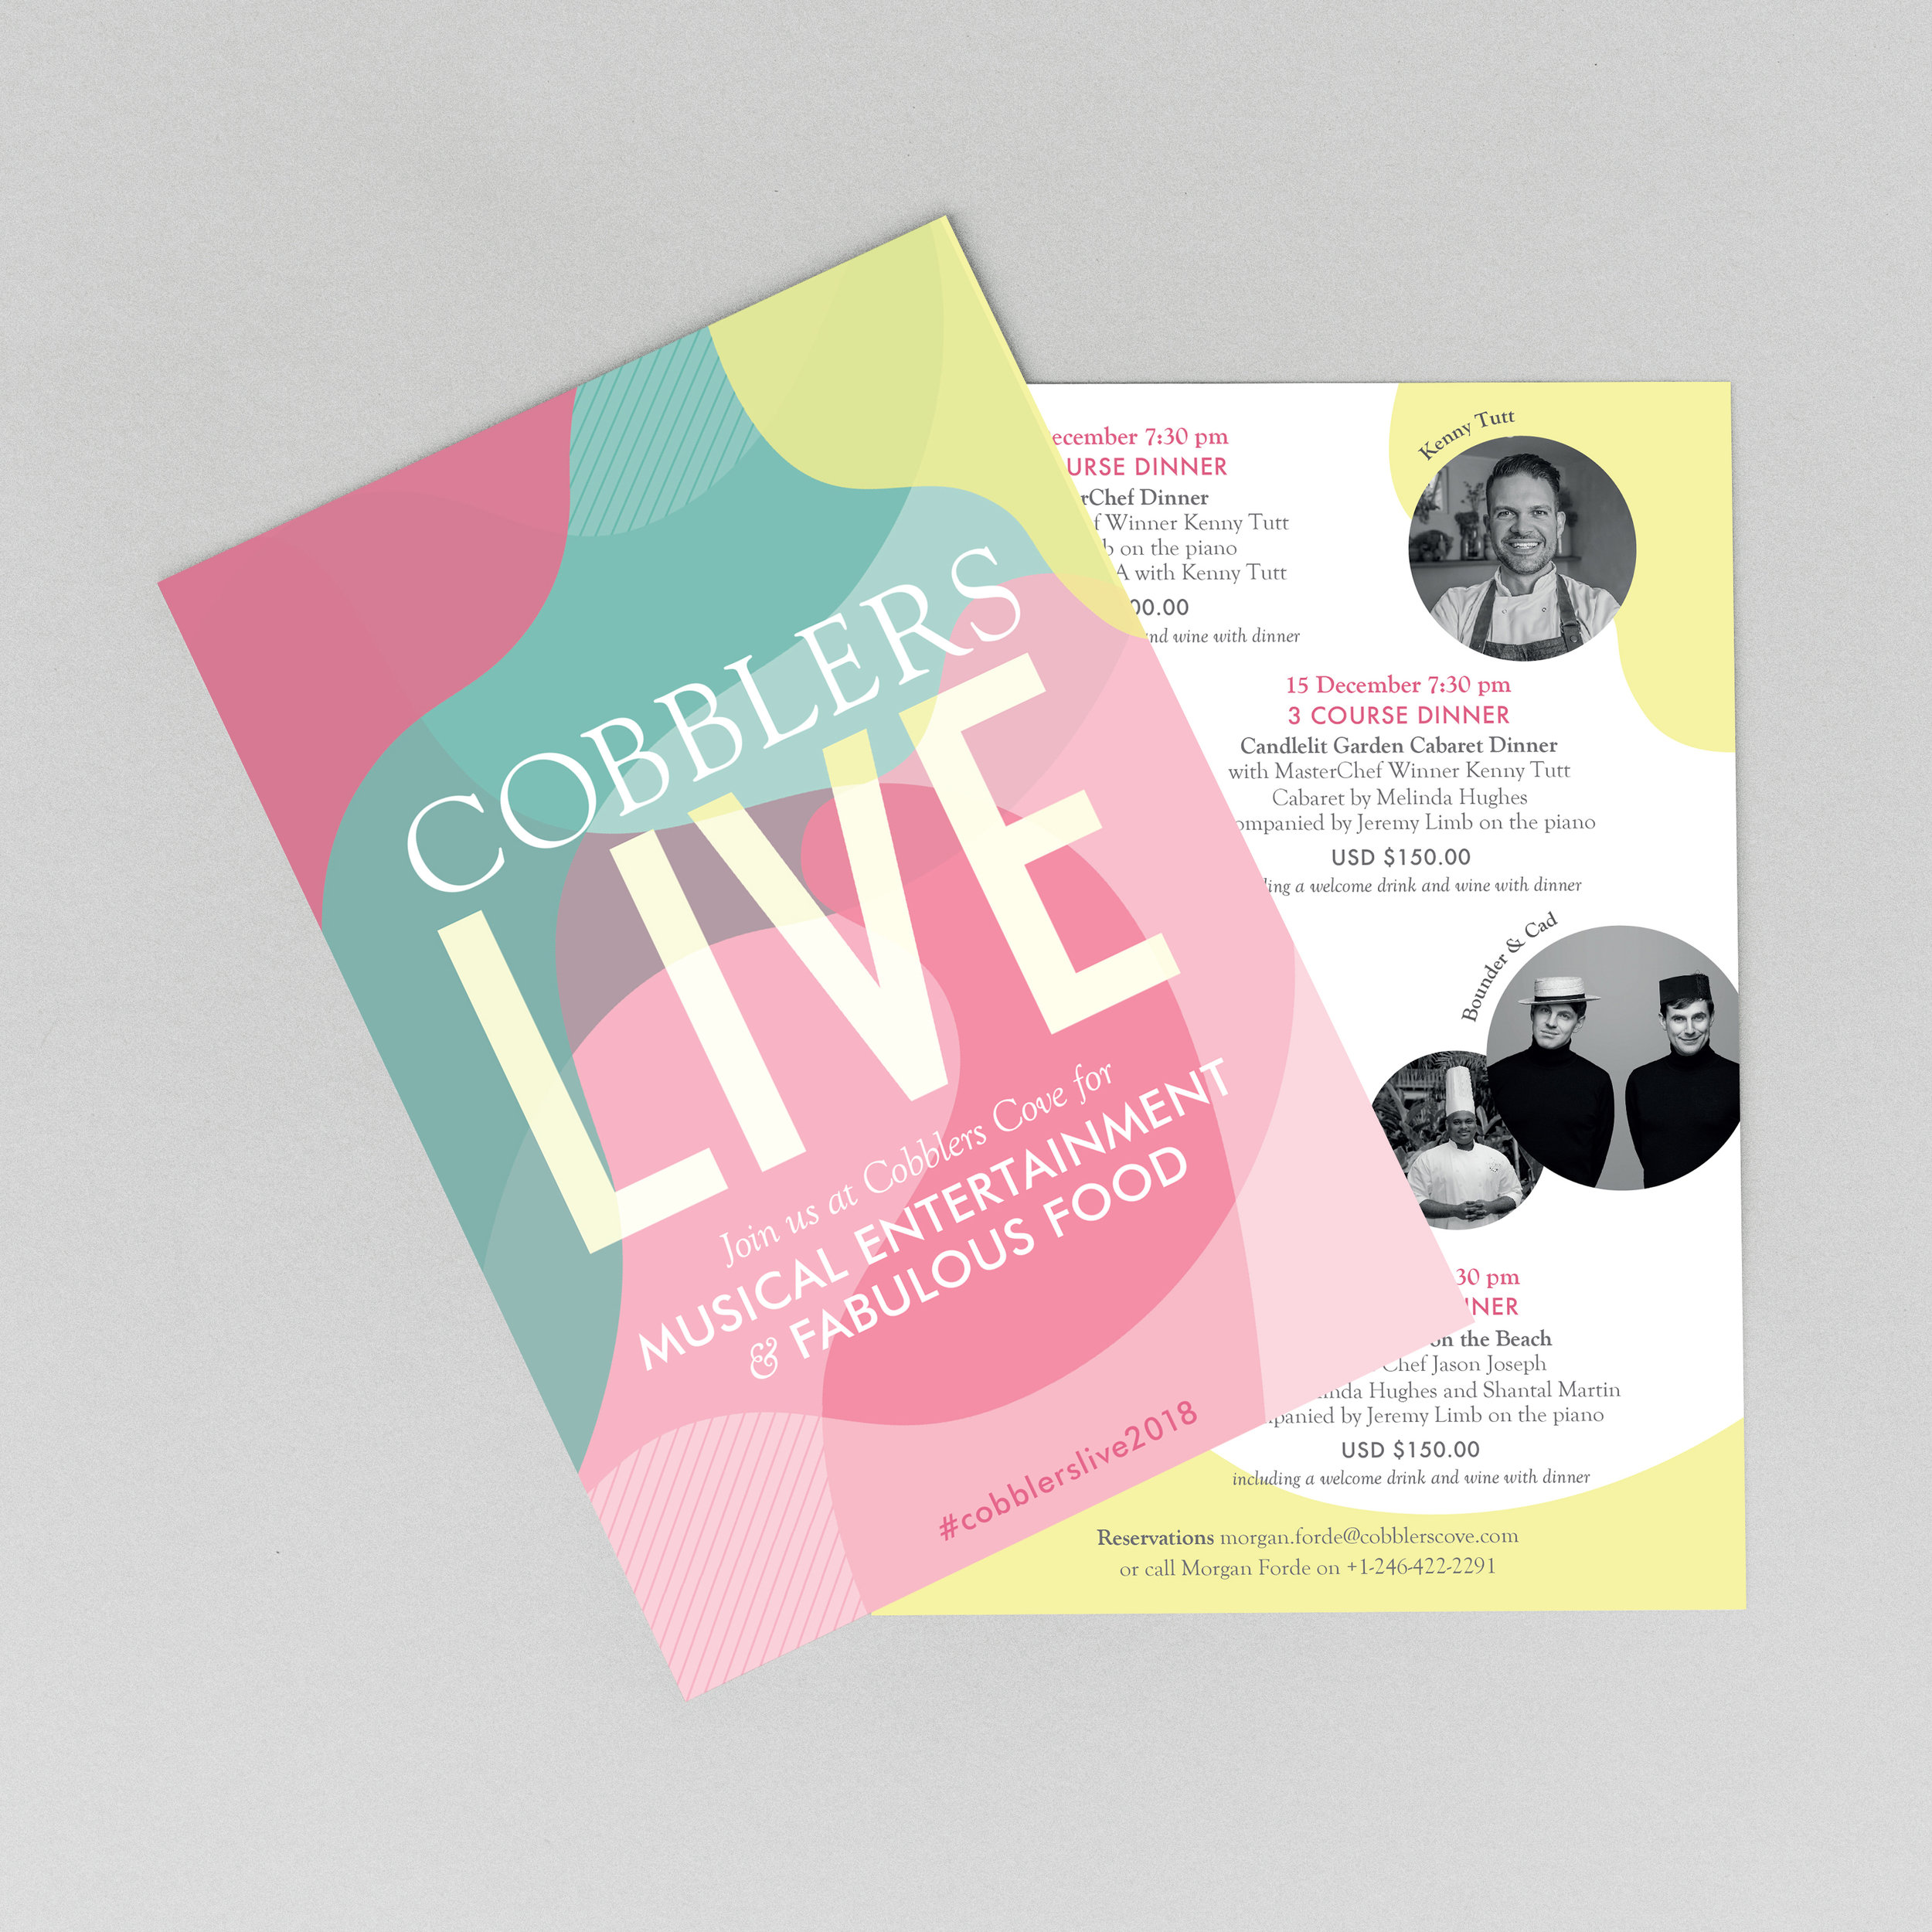 CC_LIVE INVITE.jpg